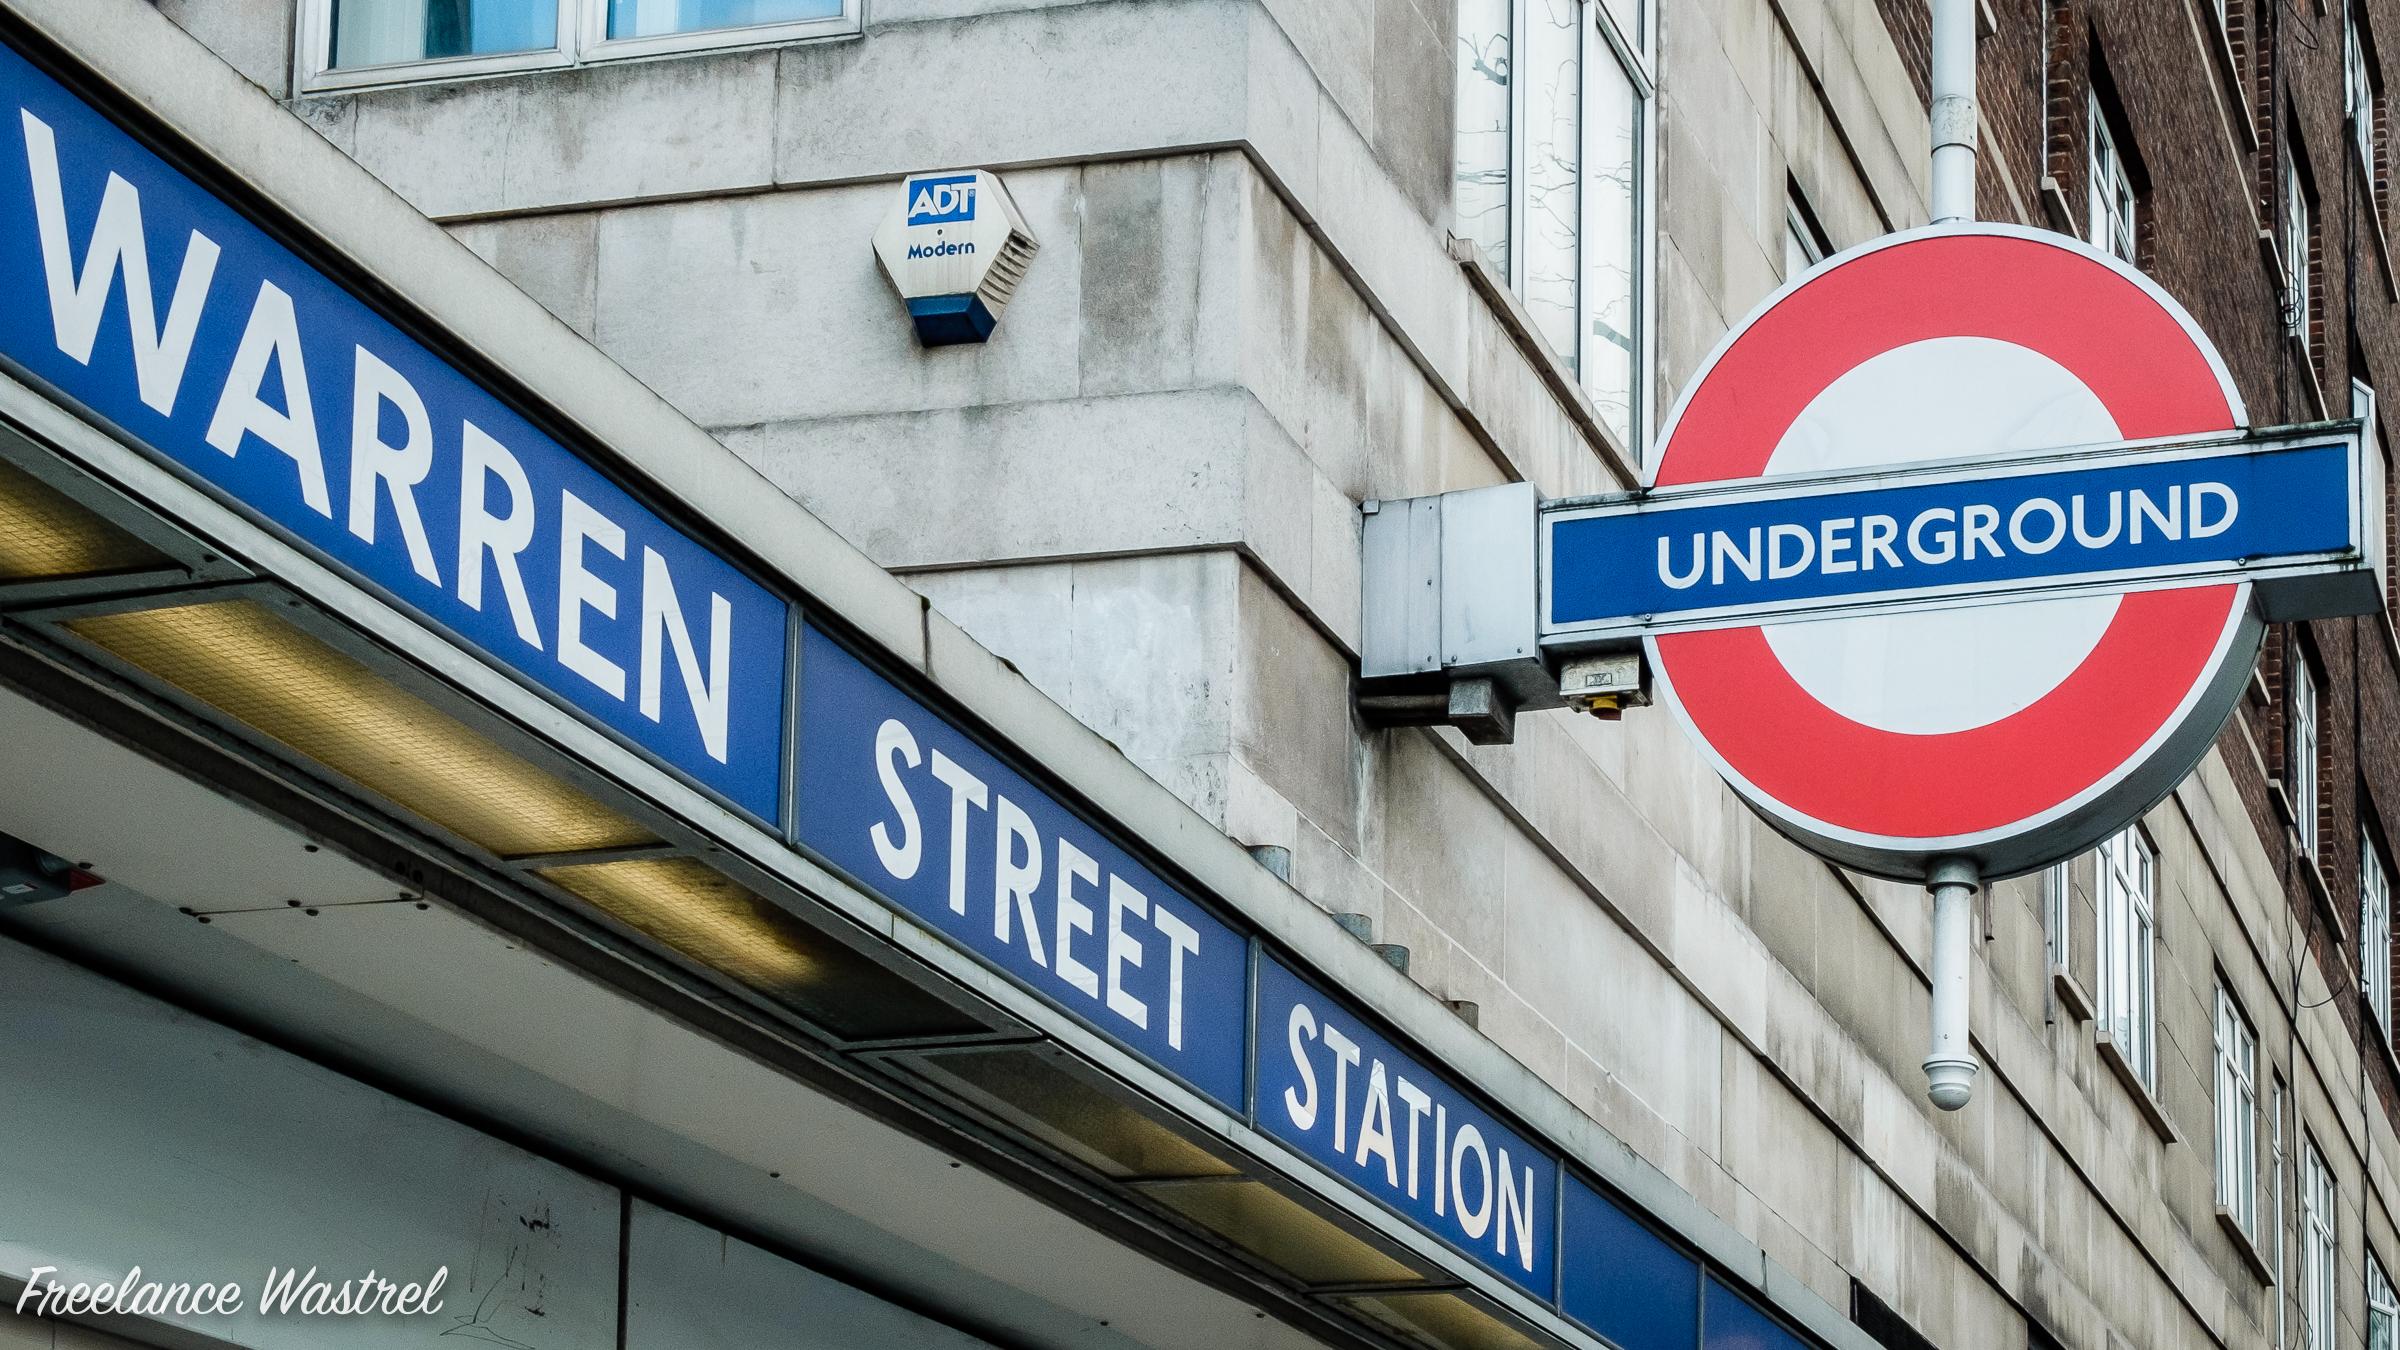 Warren Street Station